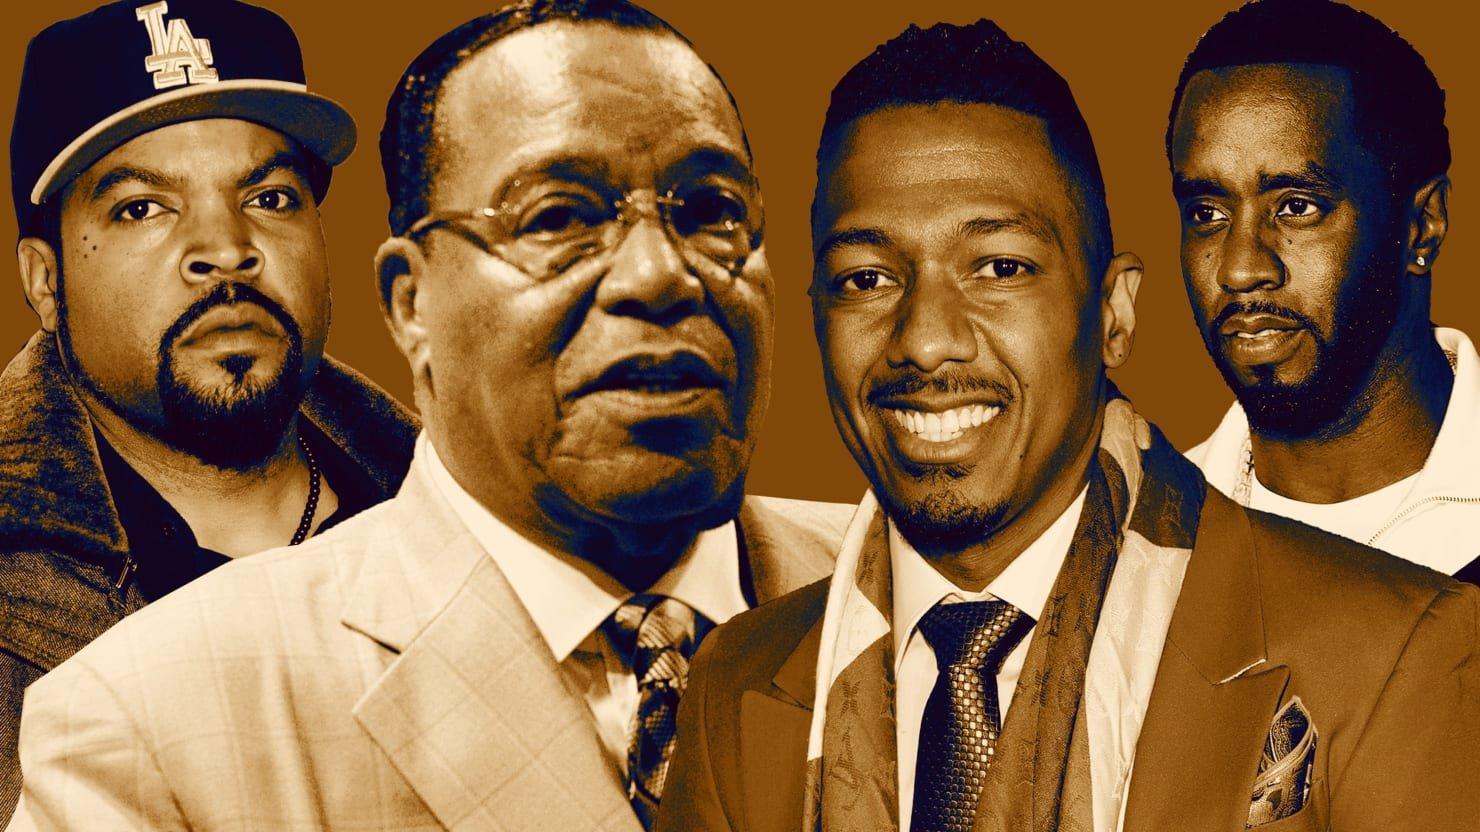 The Disturbing Rise of Anti-Semitism Among Black Celebs